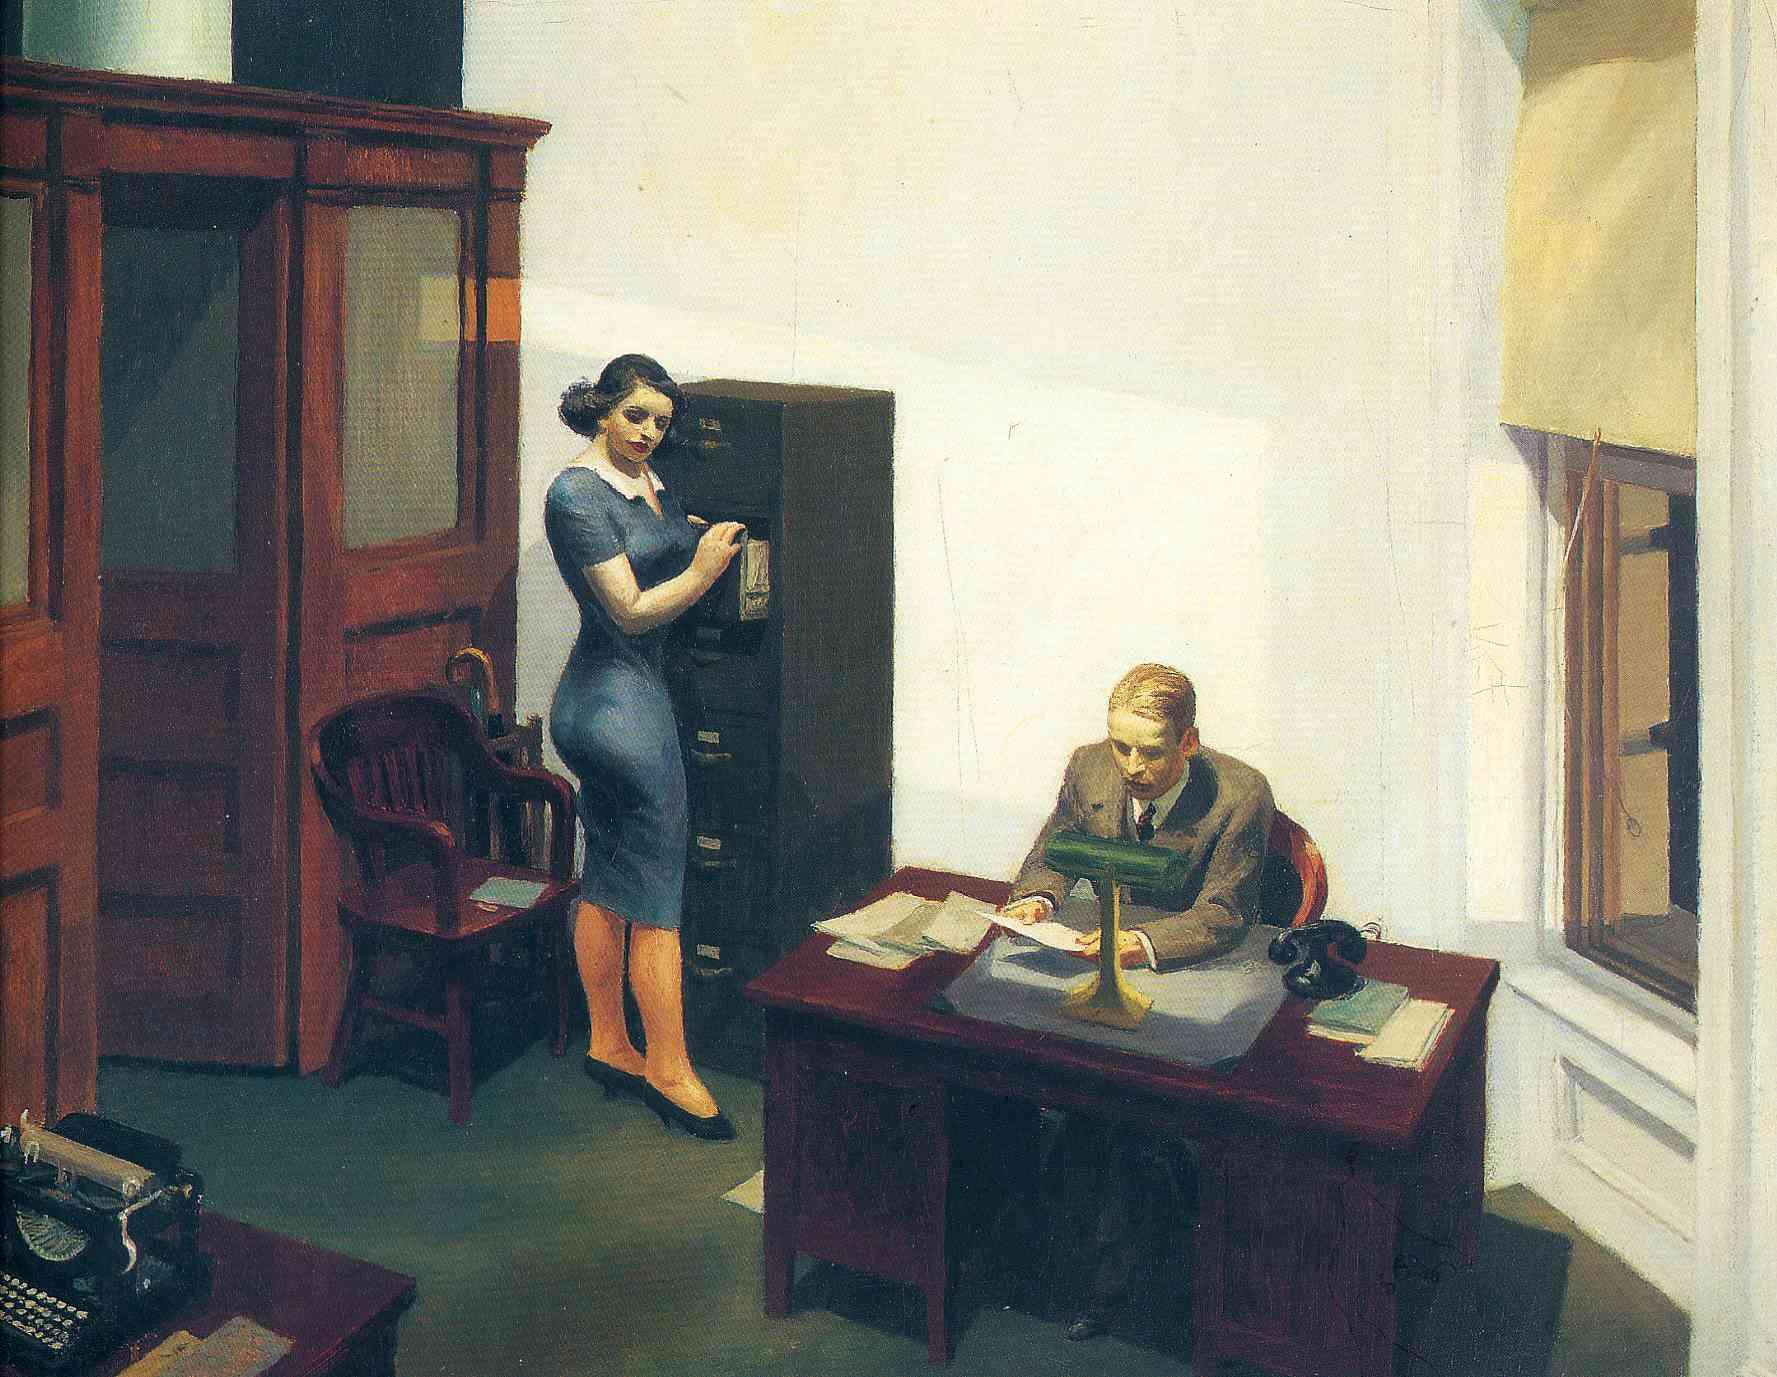 Edward Hopper, Office at Night , 1940